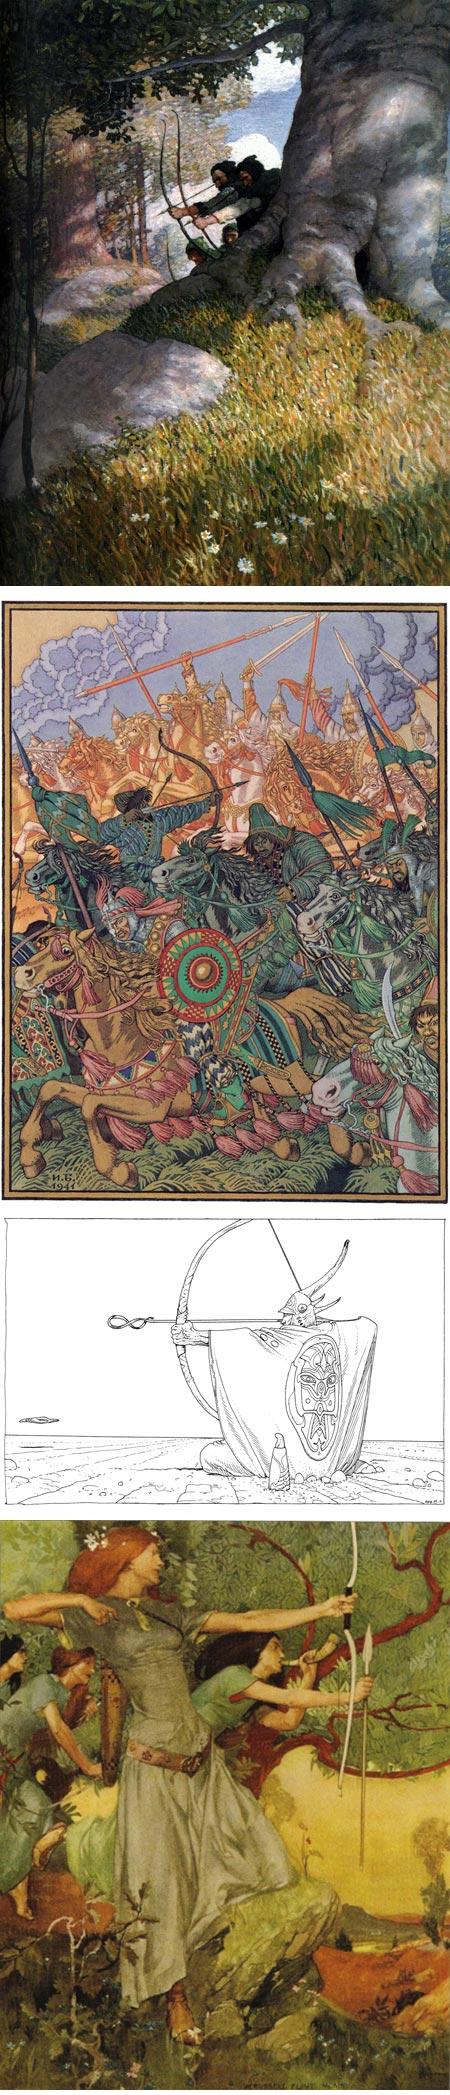 Picturing Archers on Tor.com: N.C. Wyreth, Ivan Bilibin, Jean Giraud, William Russell Flint